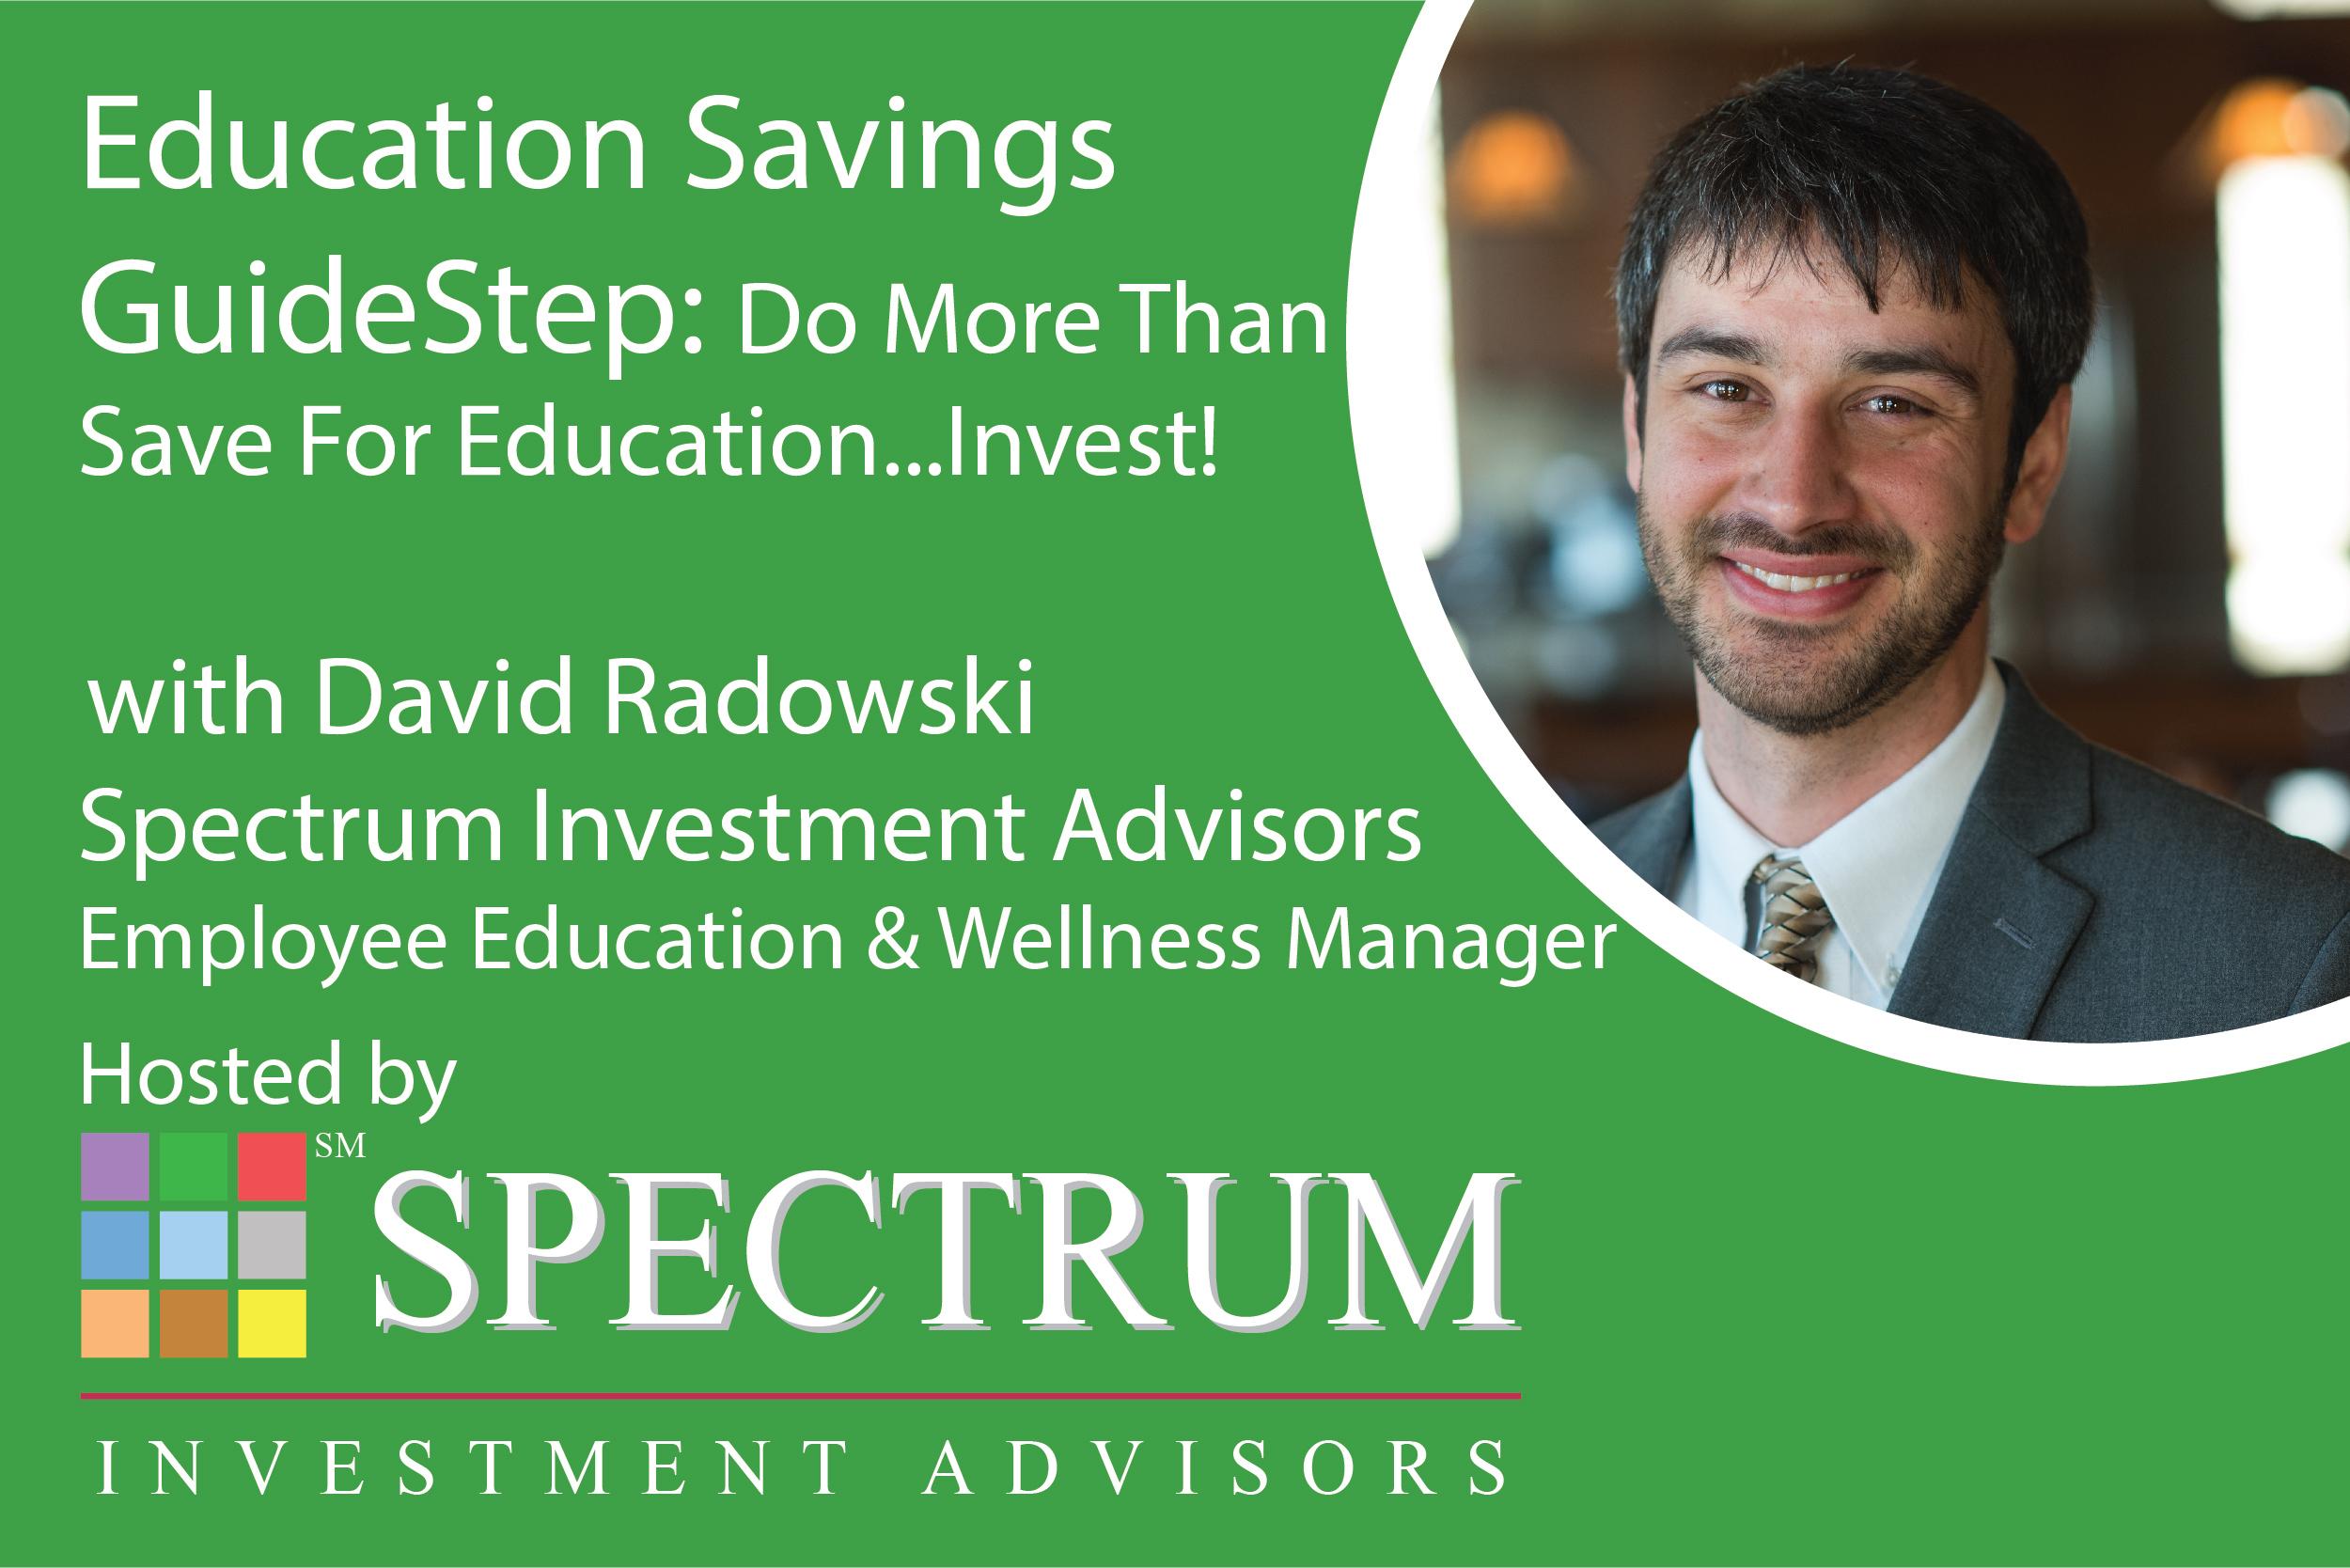 SIA Website David Radowski 2021 05 Education Savings GuideStep- Do More Than Save For Education...Invest-01